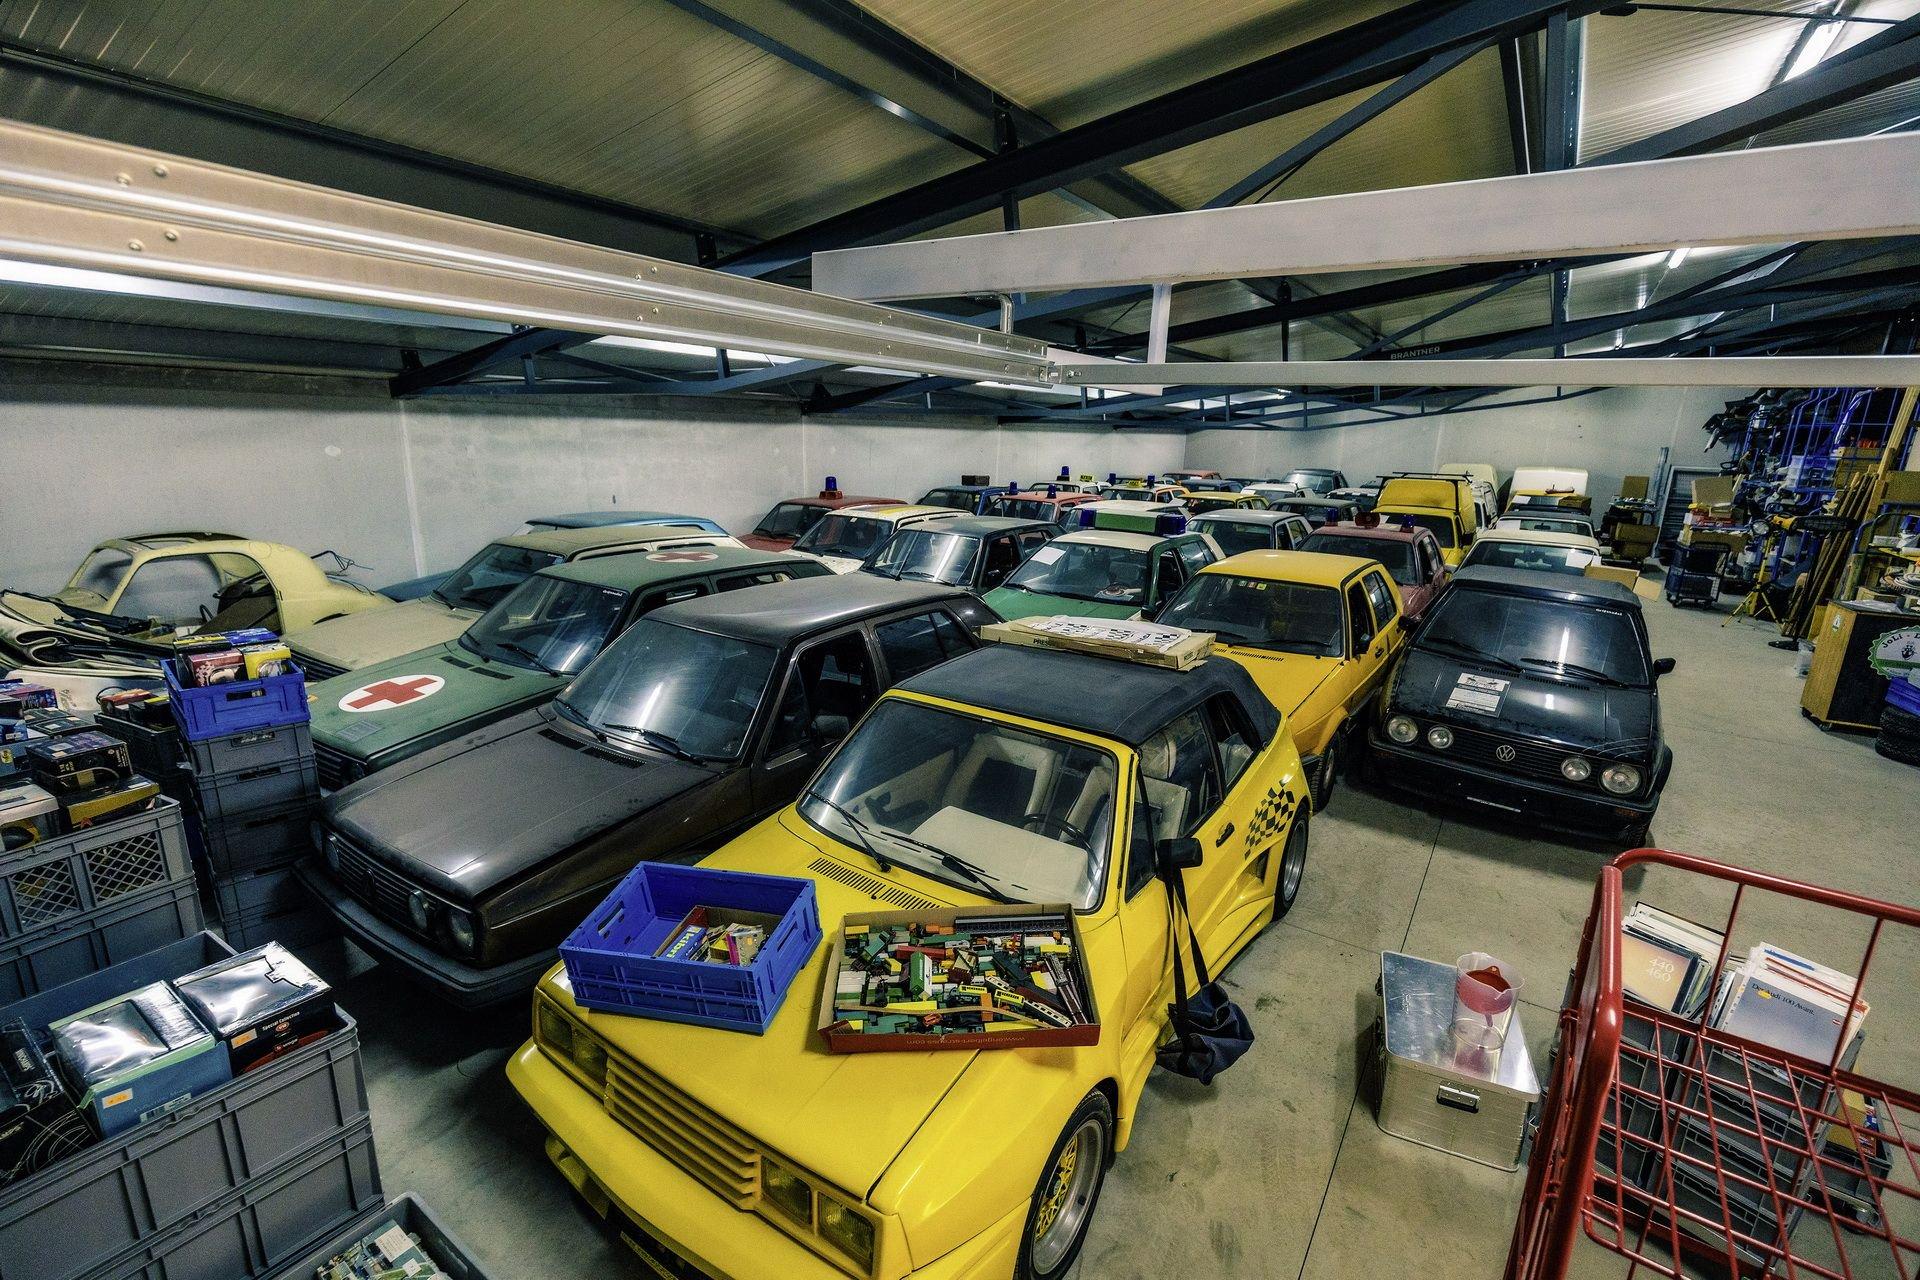 Photo of Ποια είναι η μεγαλύτερη συλλογή από VW Golf σε όλο τον κόσμο;